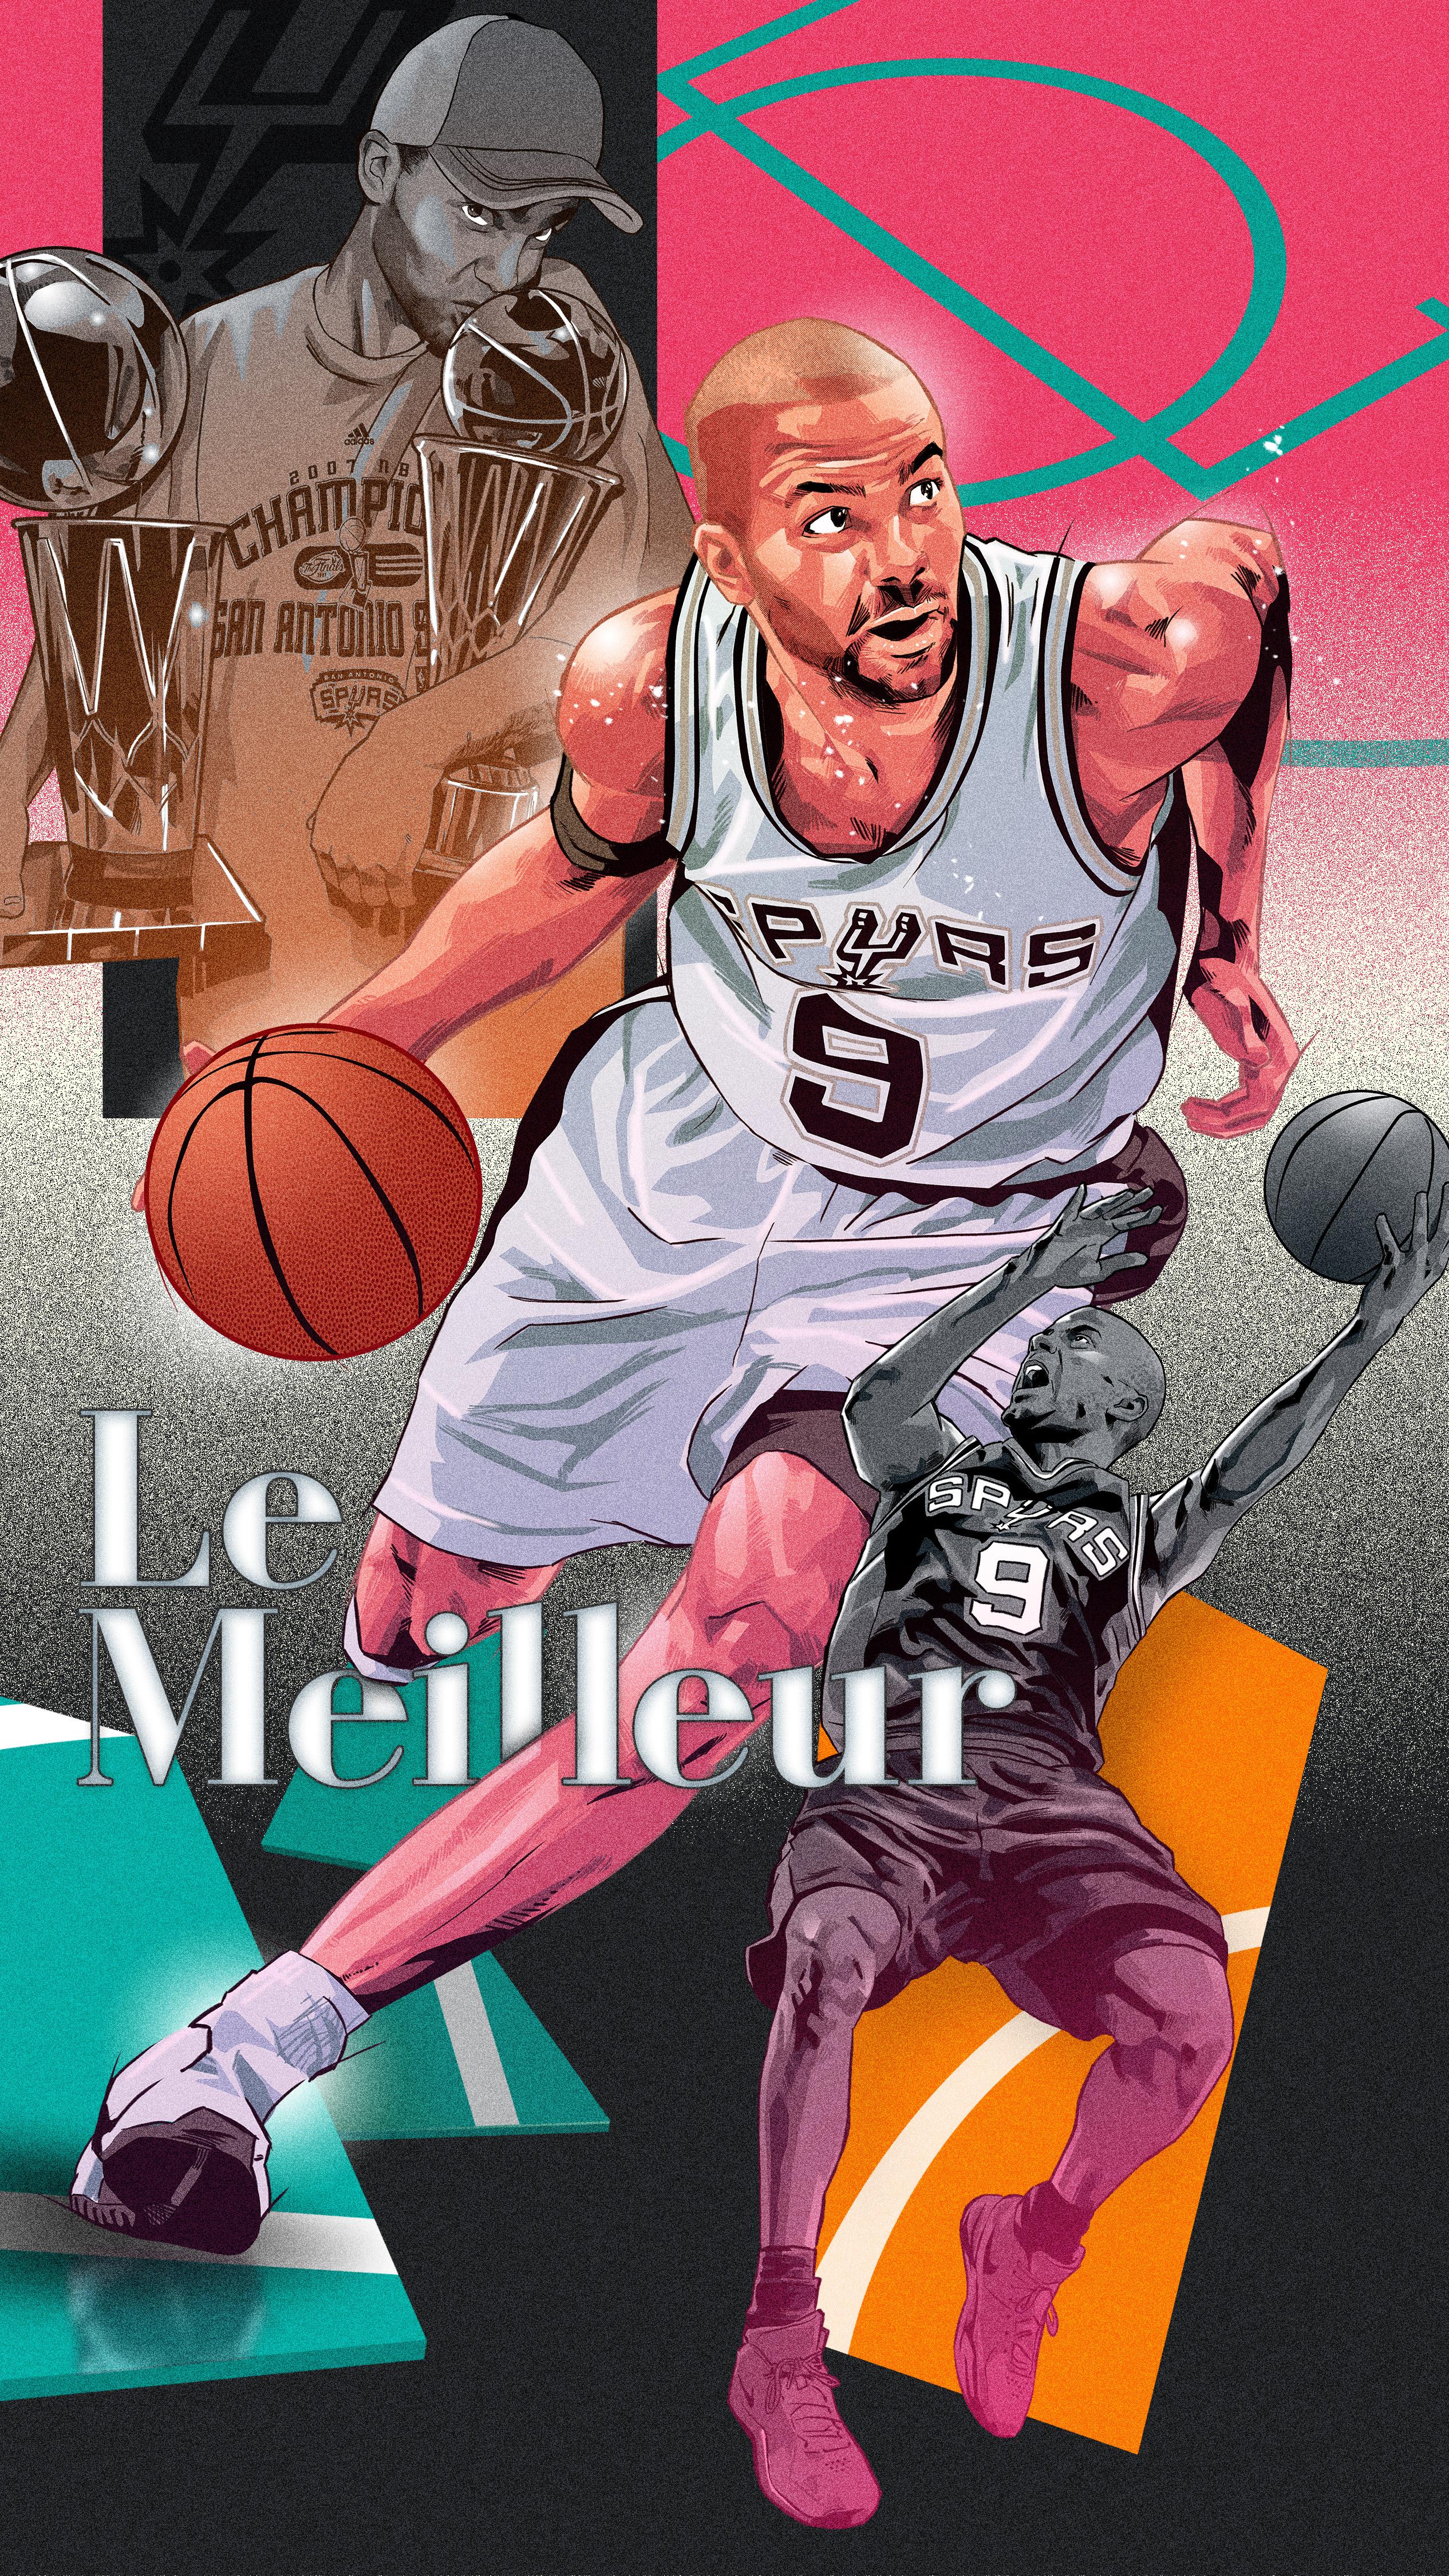 Spurs Wallpapers San Antonio Spurs 2531x4501